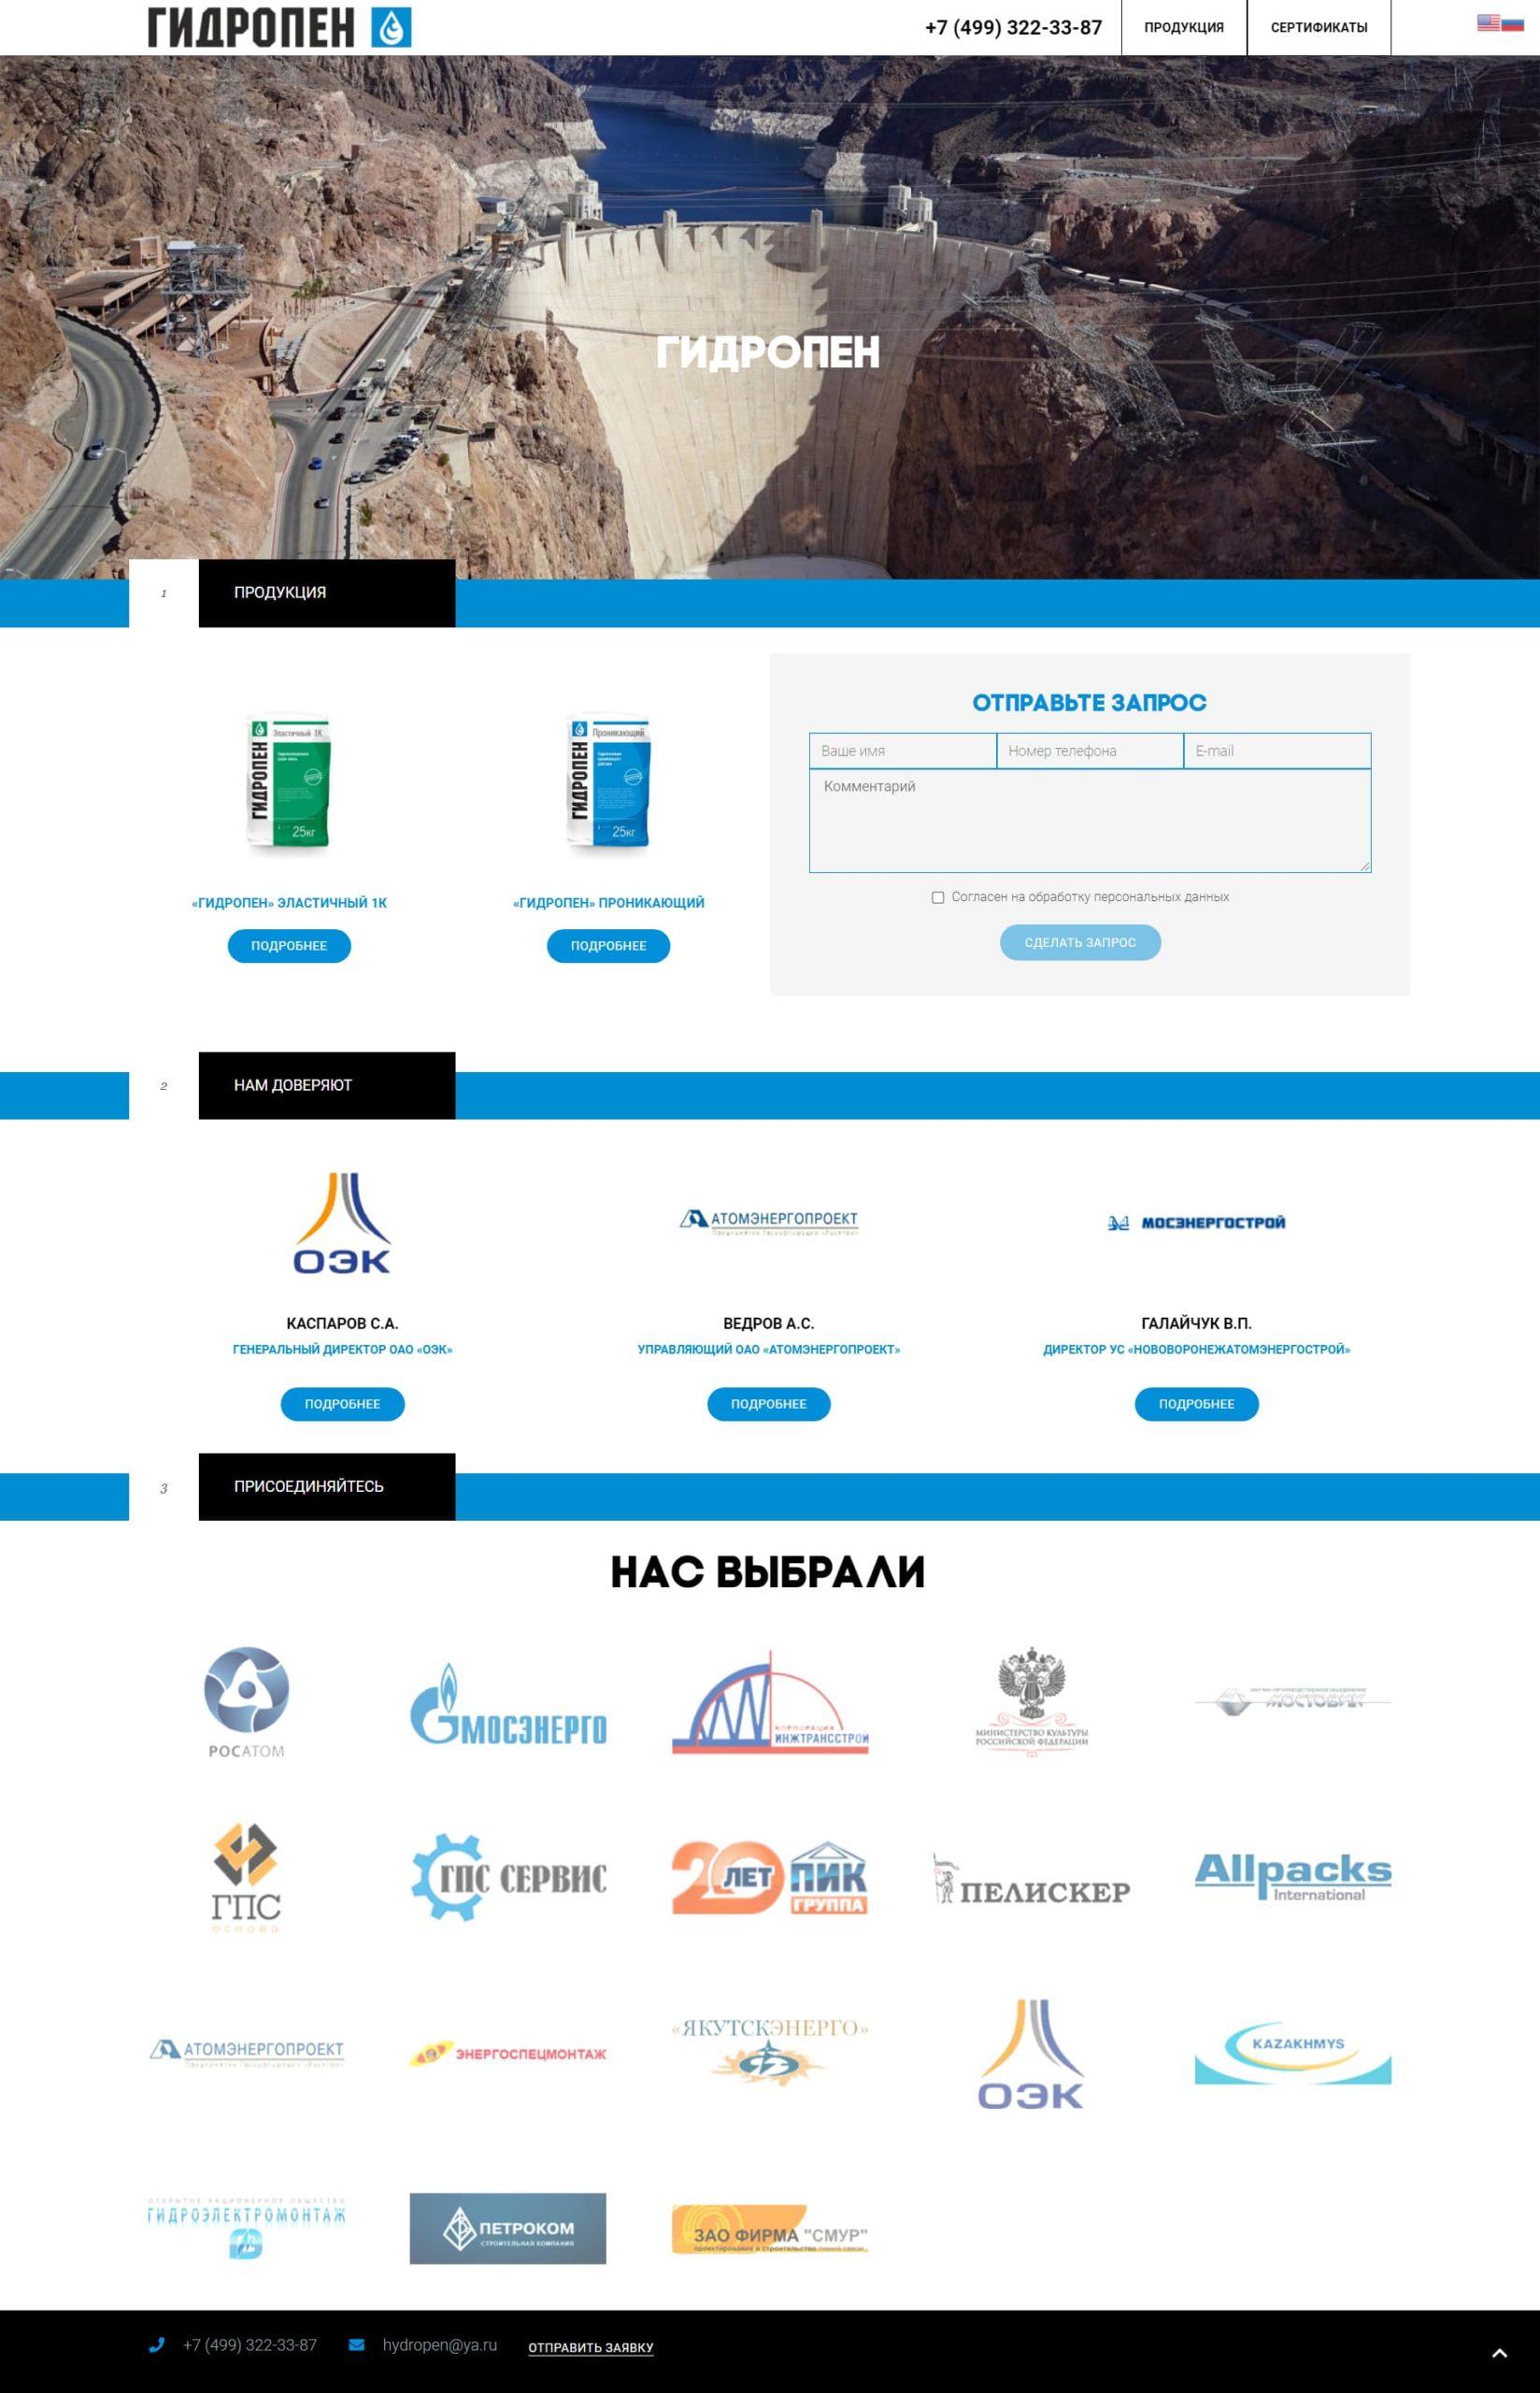 Сайт-визитка по продаже стройматериалов